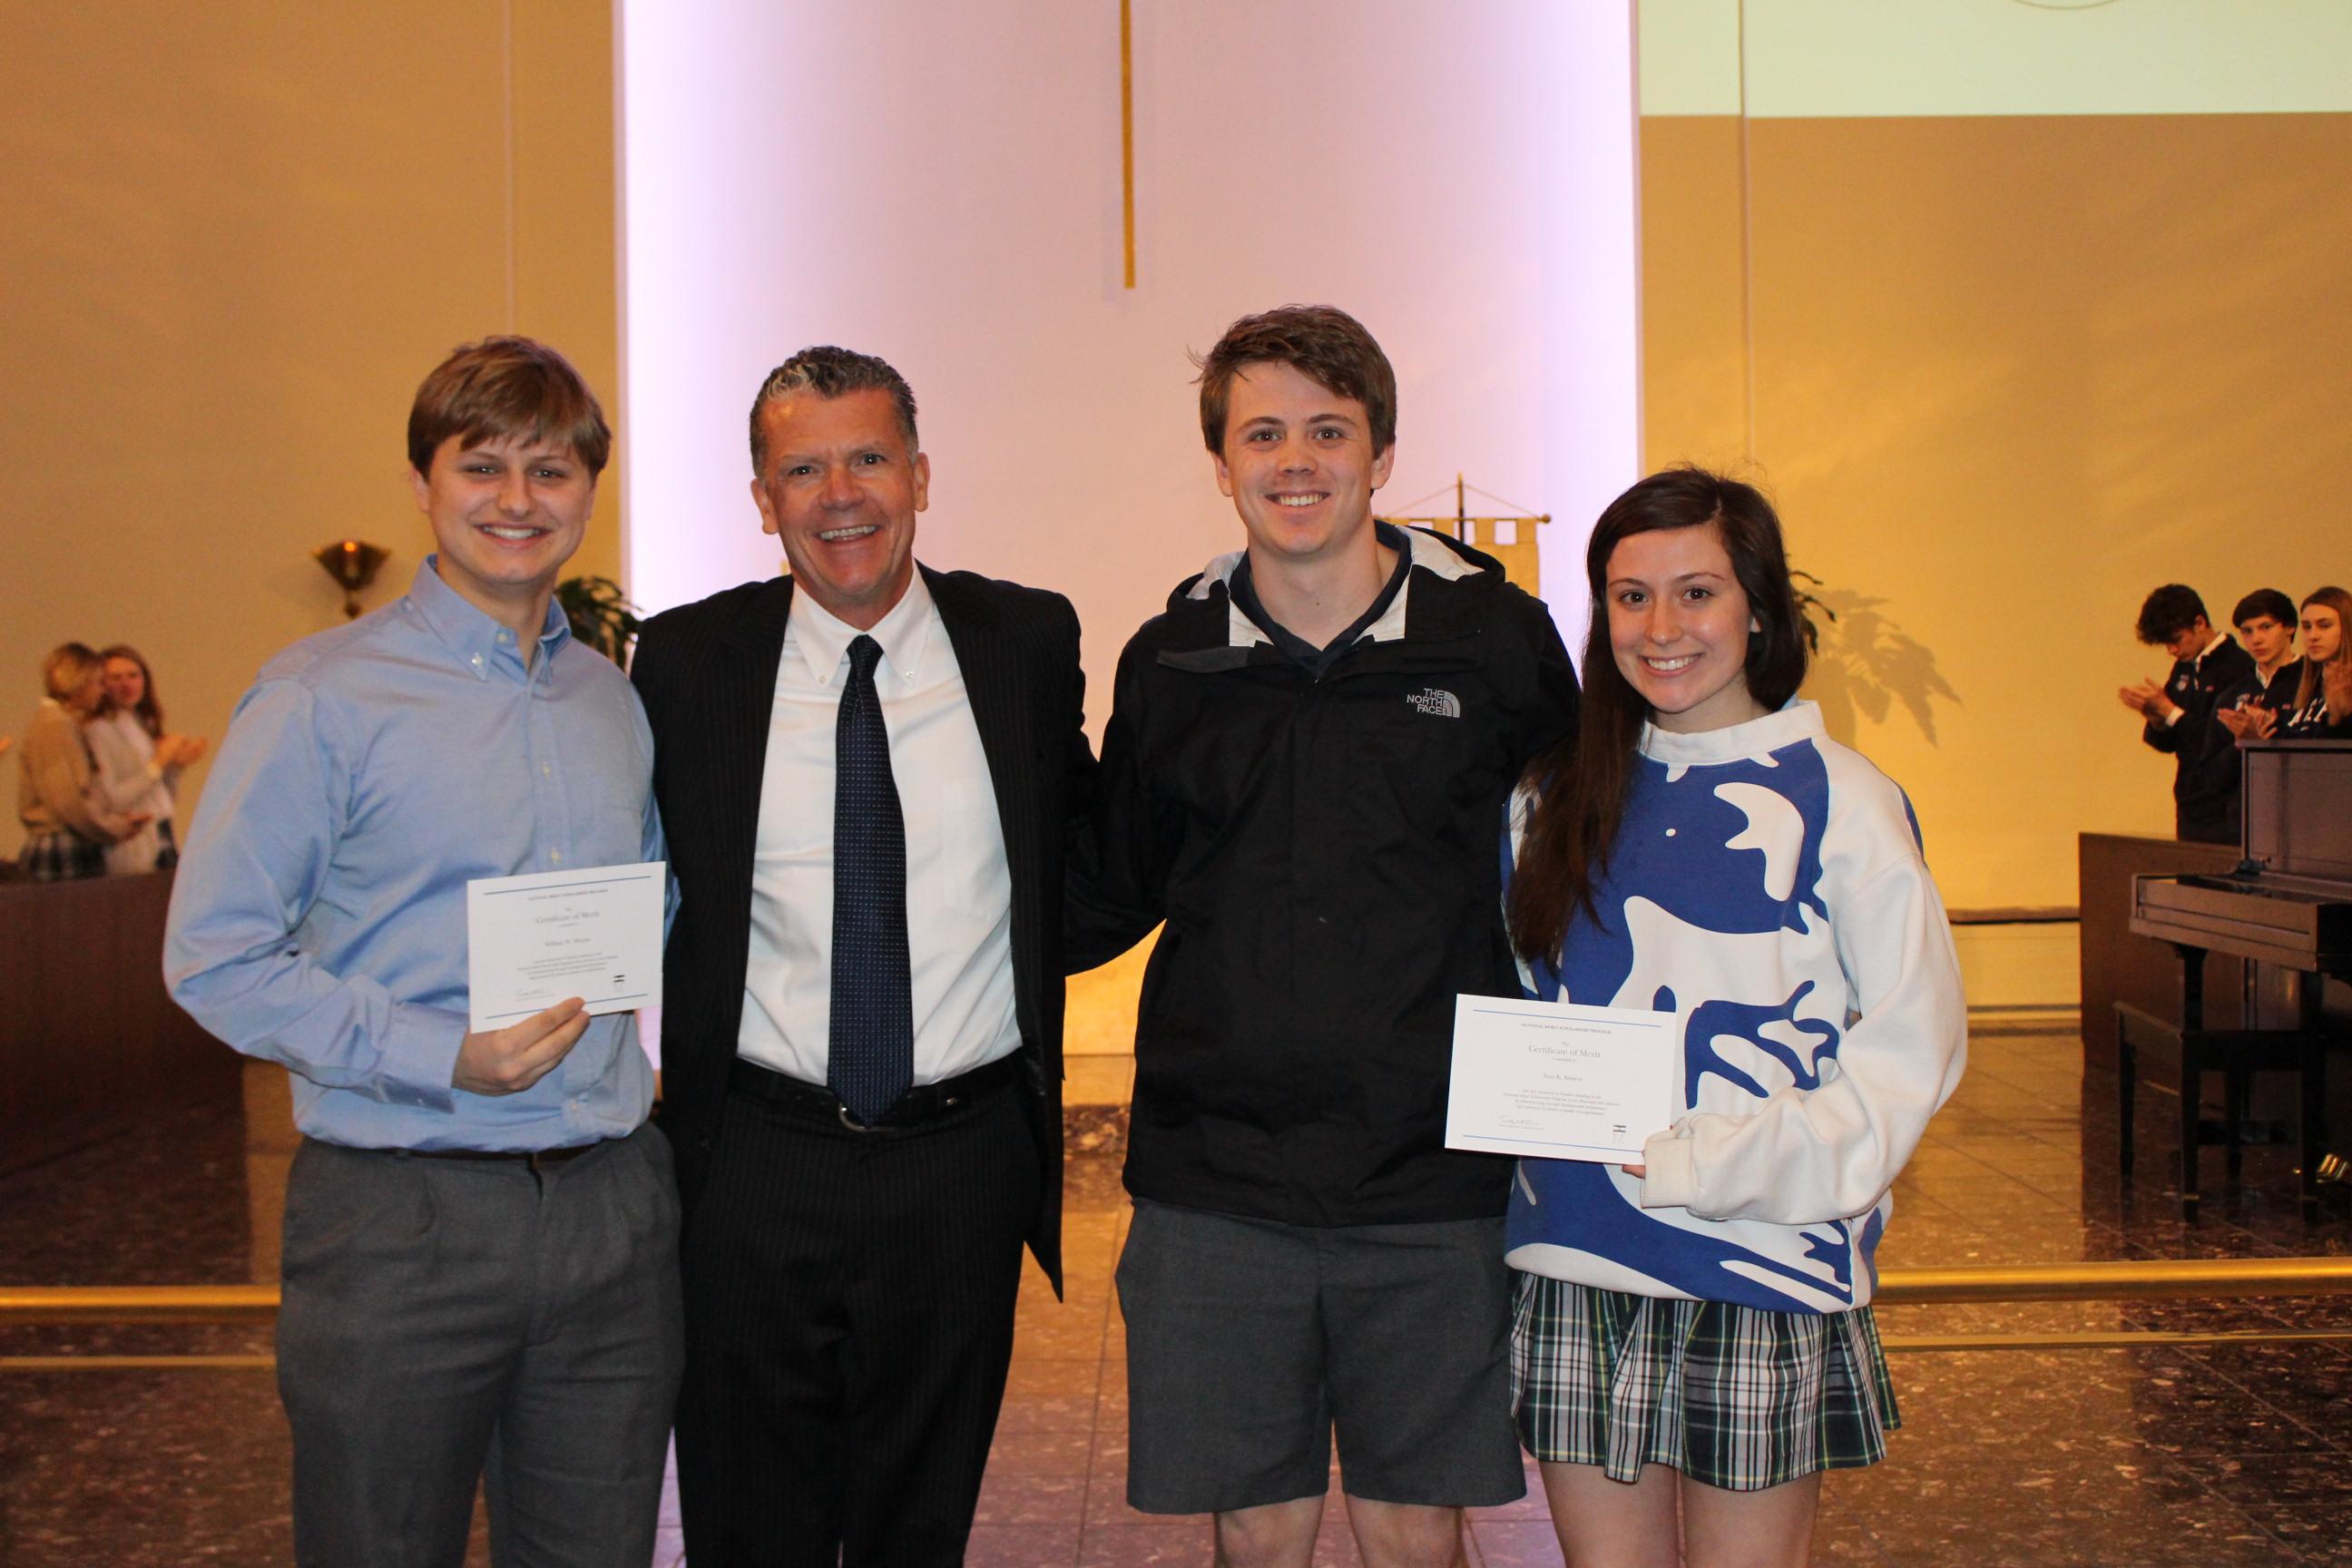 Three Students Named Finalists by National Merit Scholarship Program